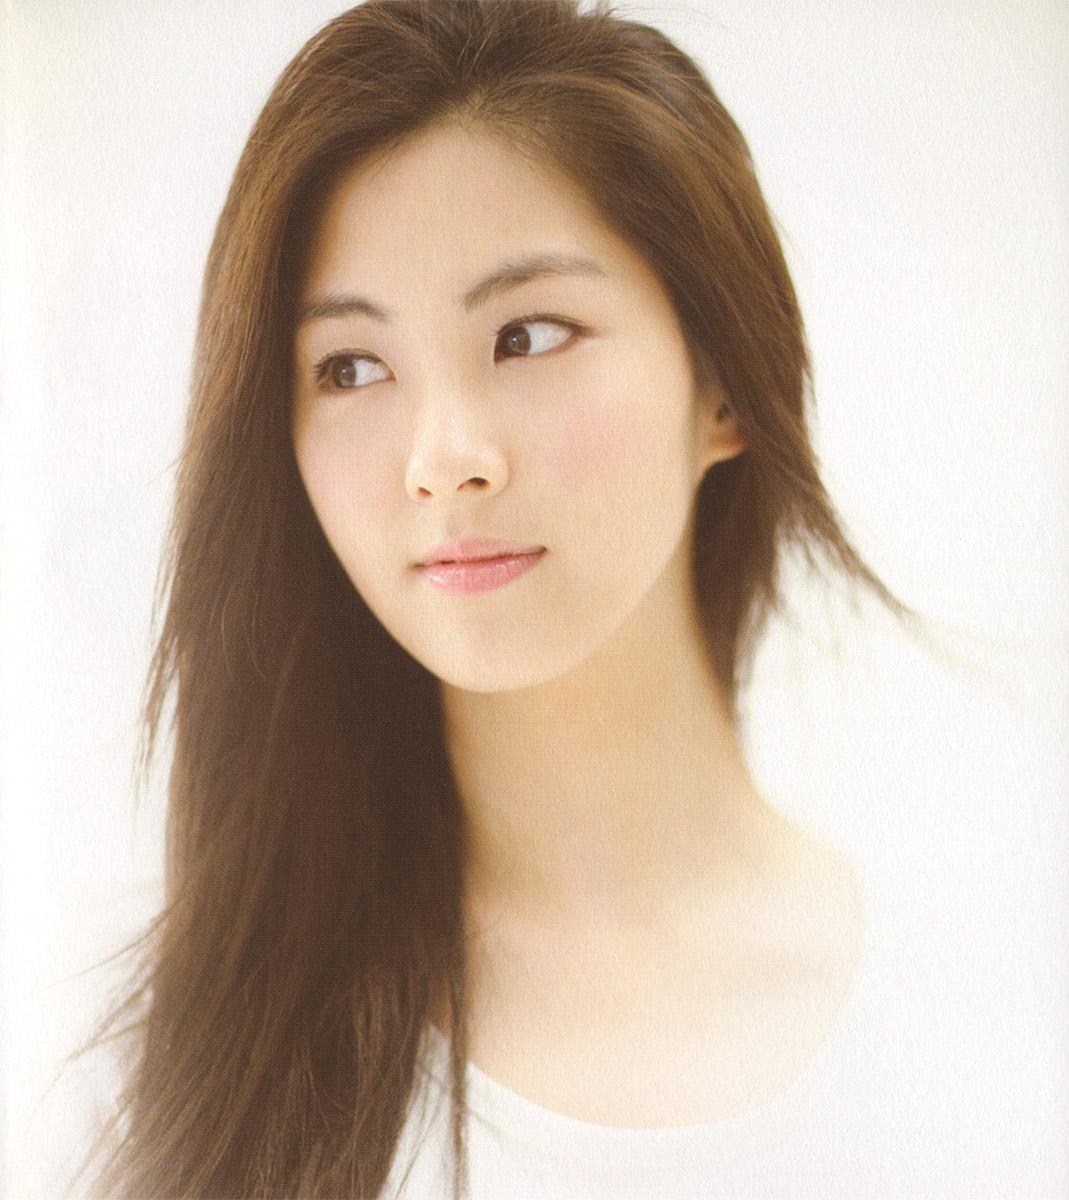 http://4.bp.blogspot.com/-JwtN9ezo7oI/Tgrq9x_lKlI/AAAAAAAACEE/xm8tcFIAPo8/s1600/Seohyun+SNSD.jpg